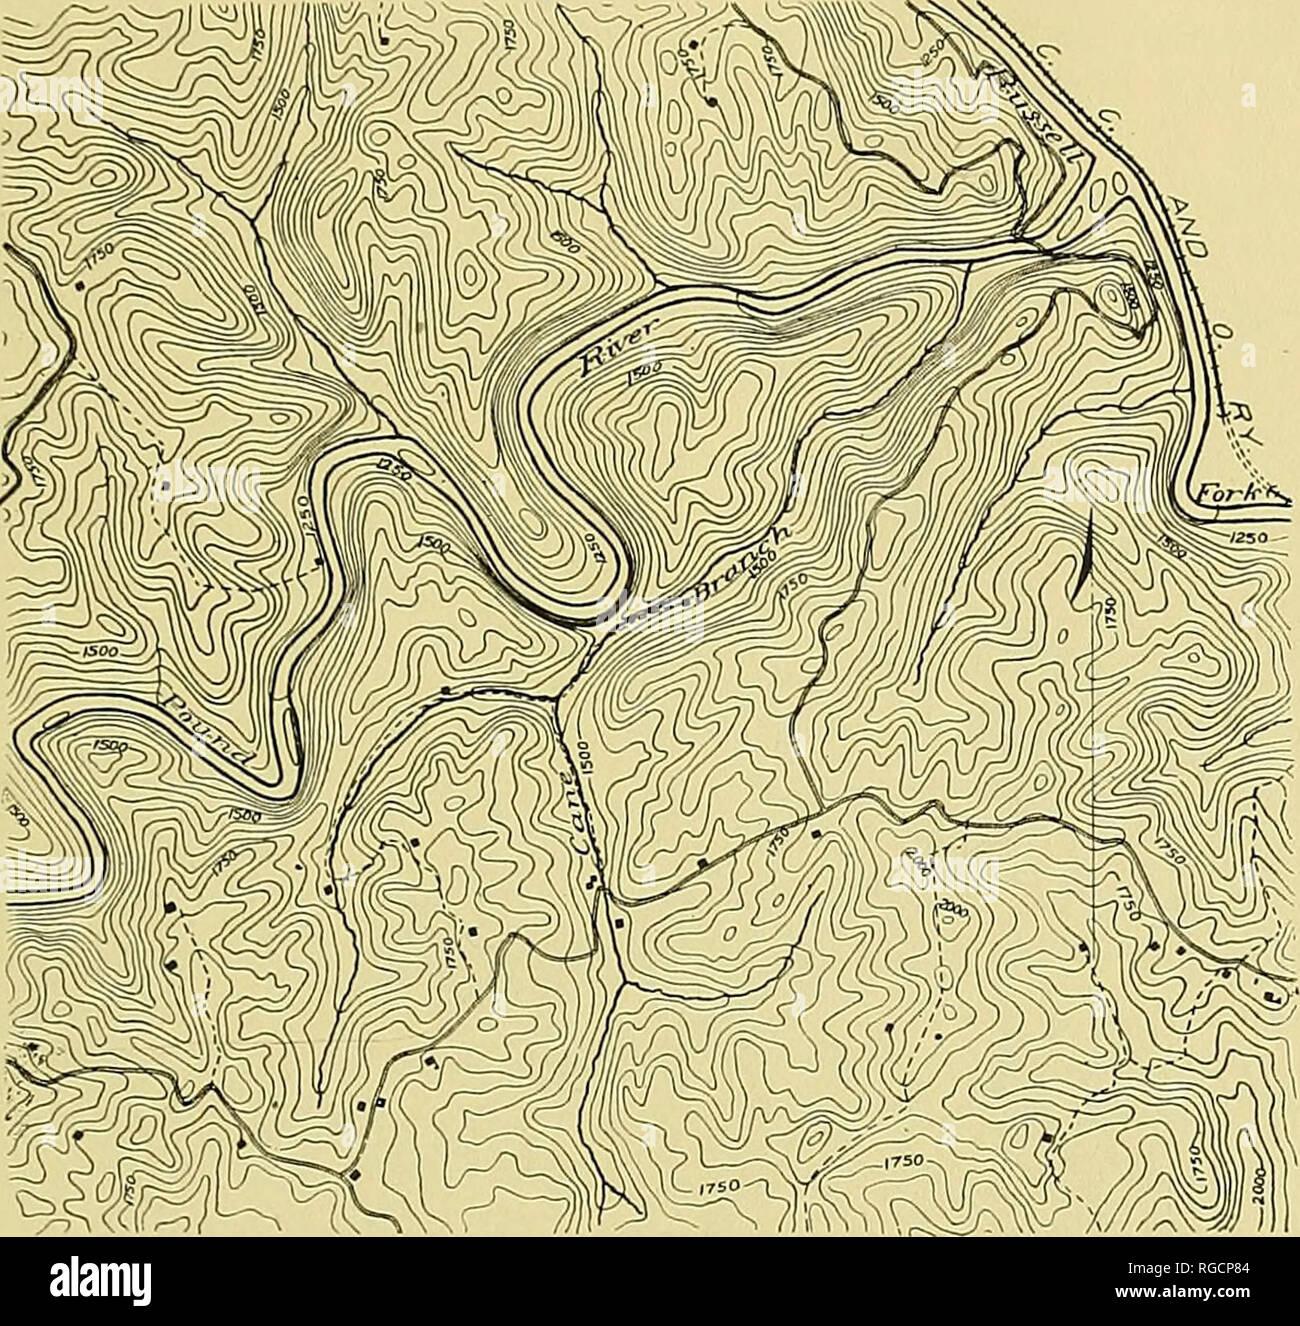 Topographic Map River Stock Photos Amp Topographic Map River Stock Images